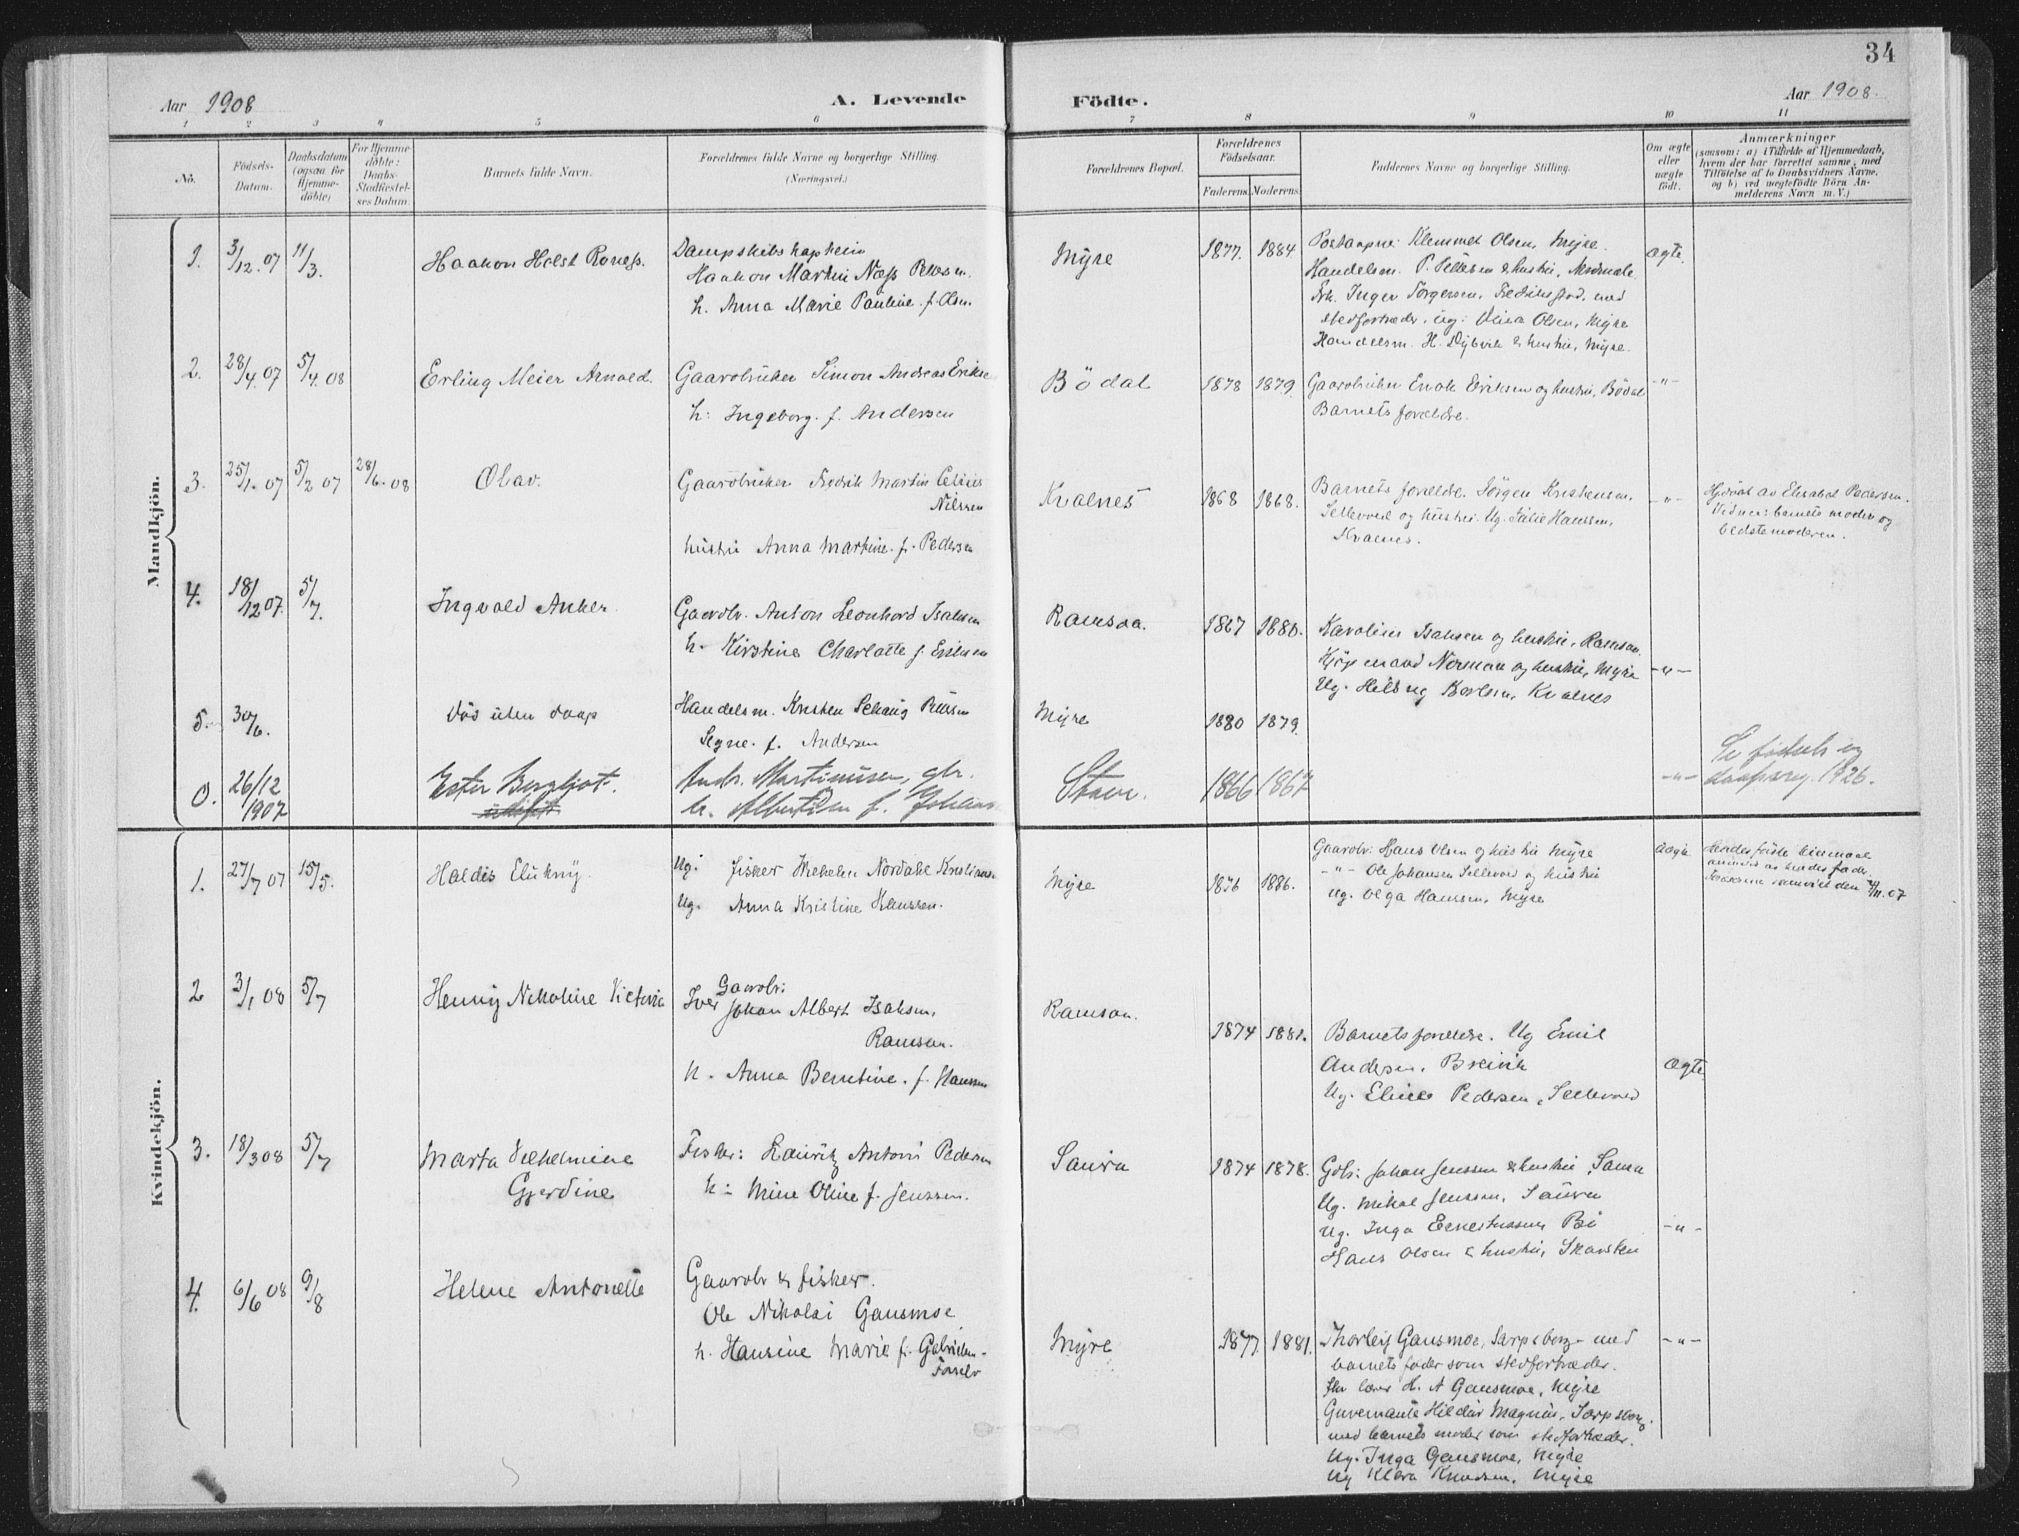 SAT, Ministerialprotokoller, klokkerbøker og fødselsregistre - Nordland, 897/L1400: Ministerialbok nr. 897A07, 1897-1908, s. 34